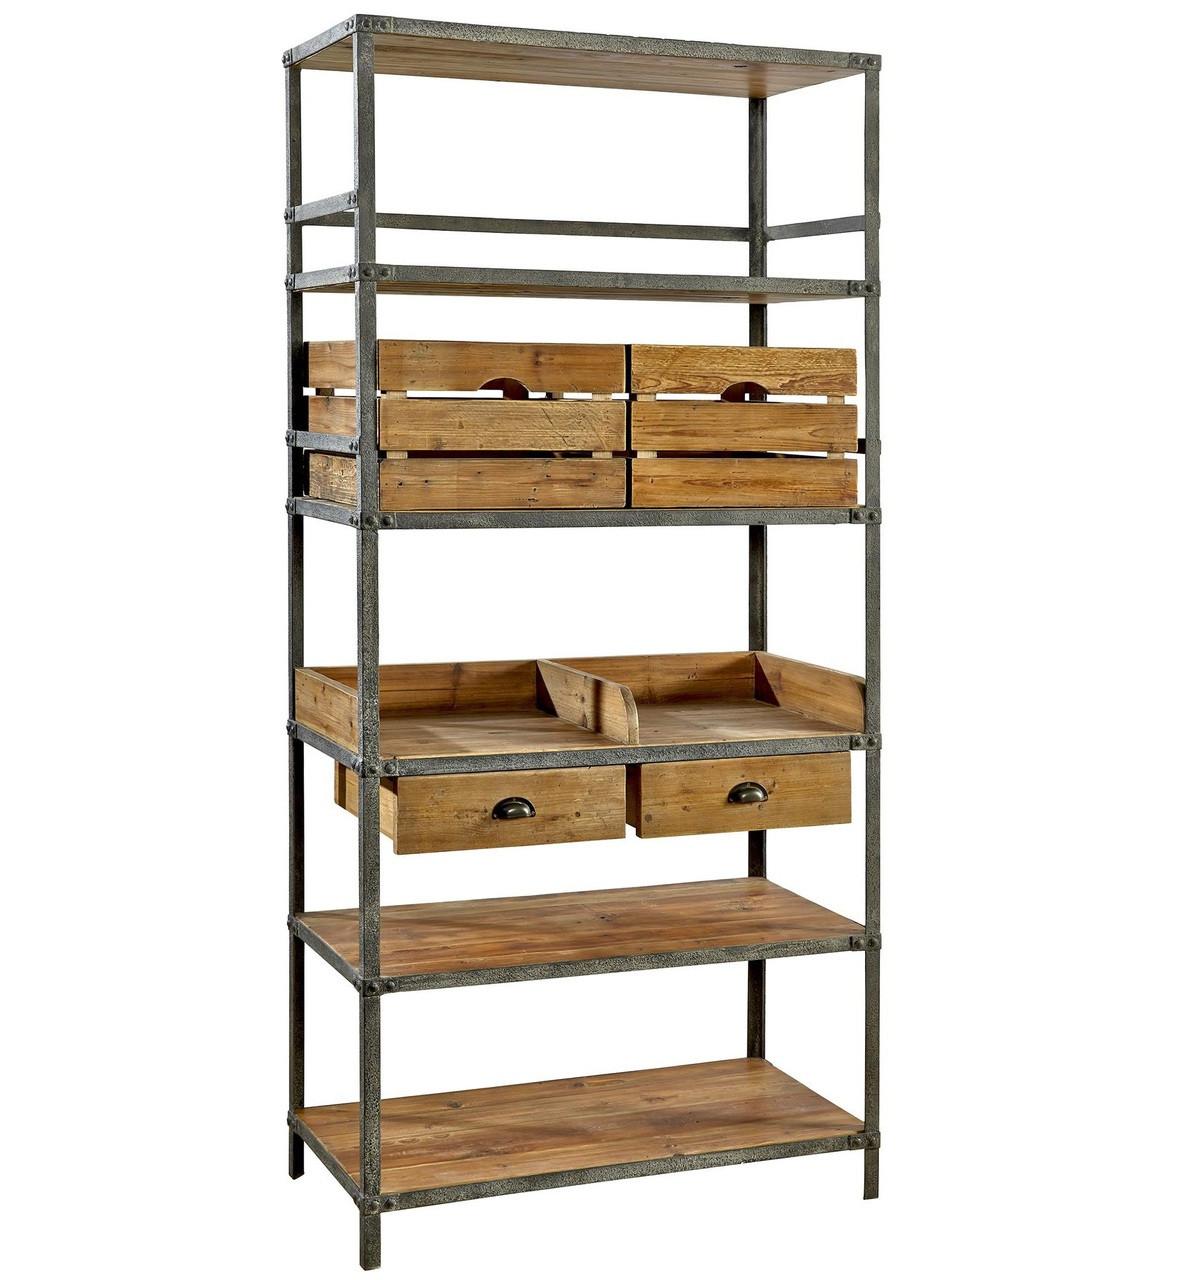 Perfect Breeland Industrial Metal + Wood Bookcase With Storage Bins